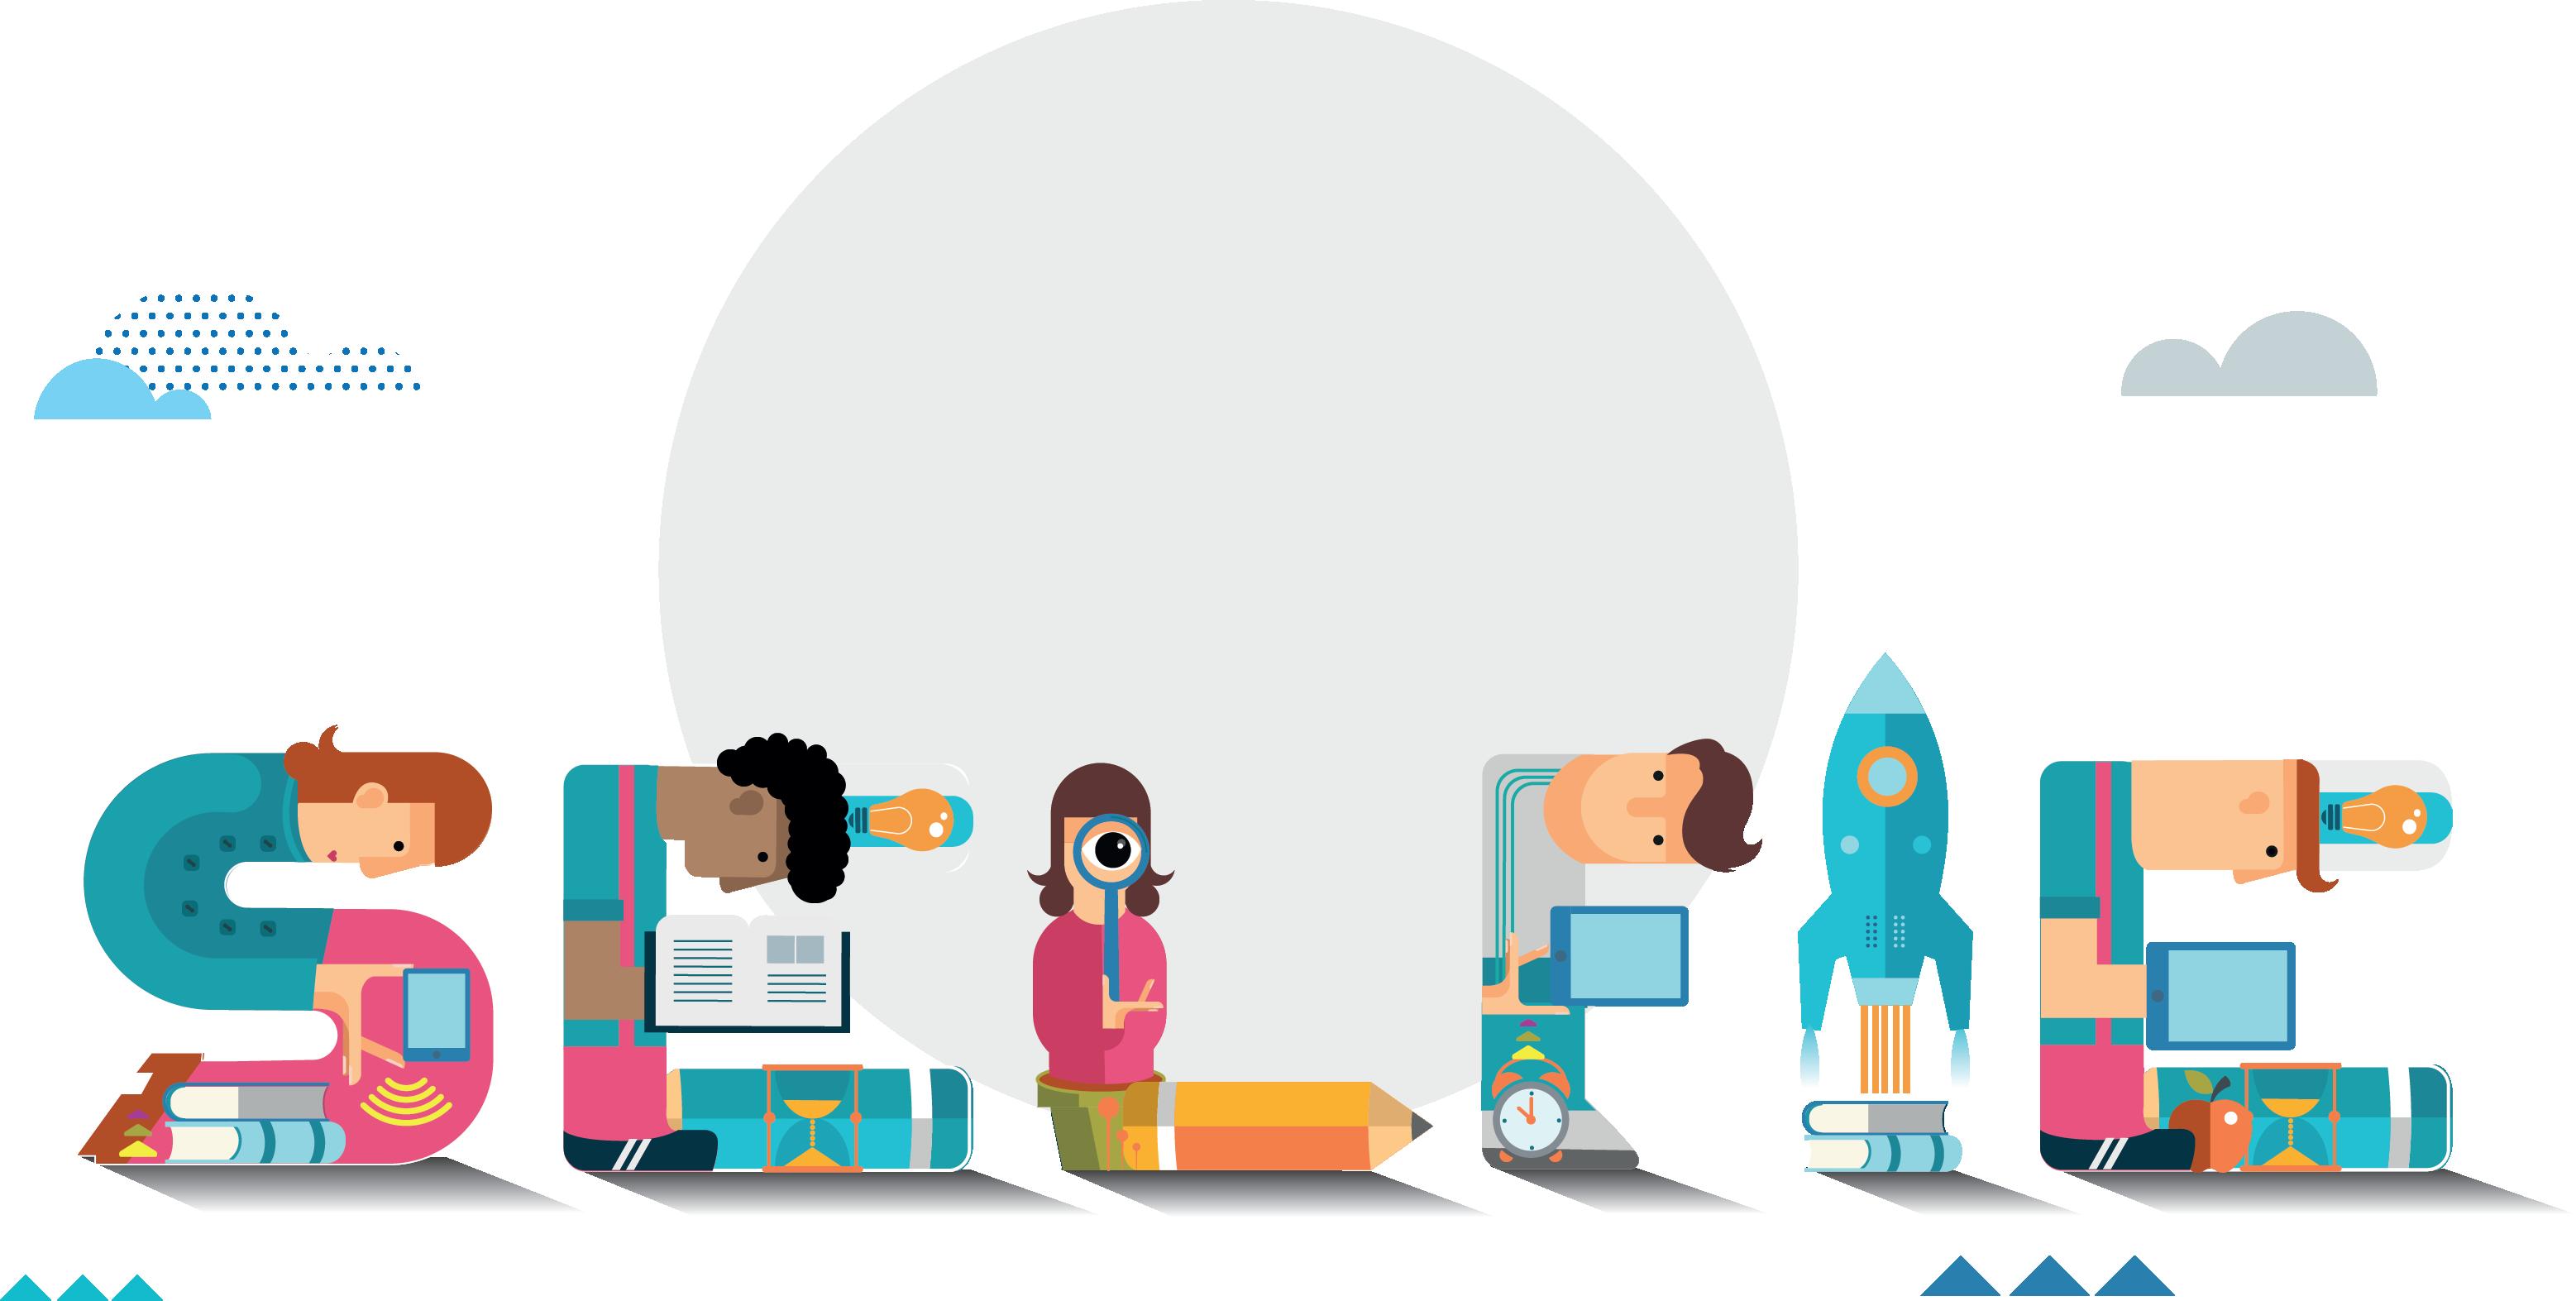 MOOC tečaj o izgradnji školske digitalne strategije - Slika